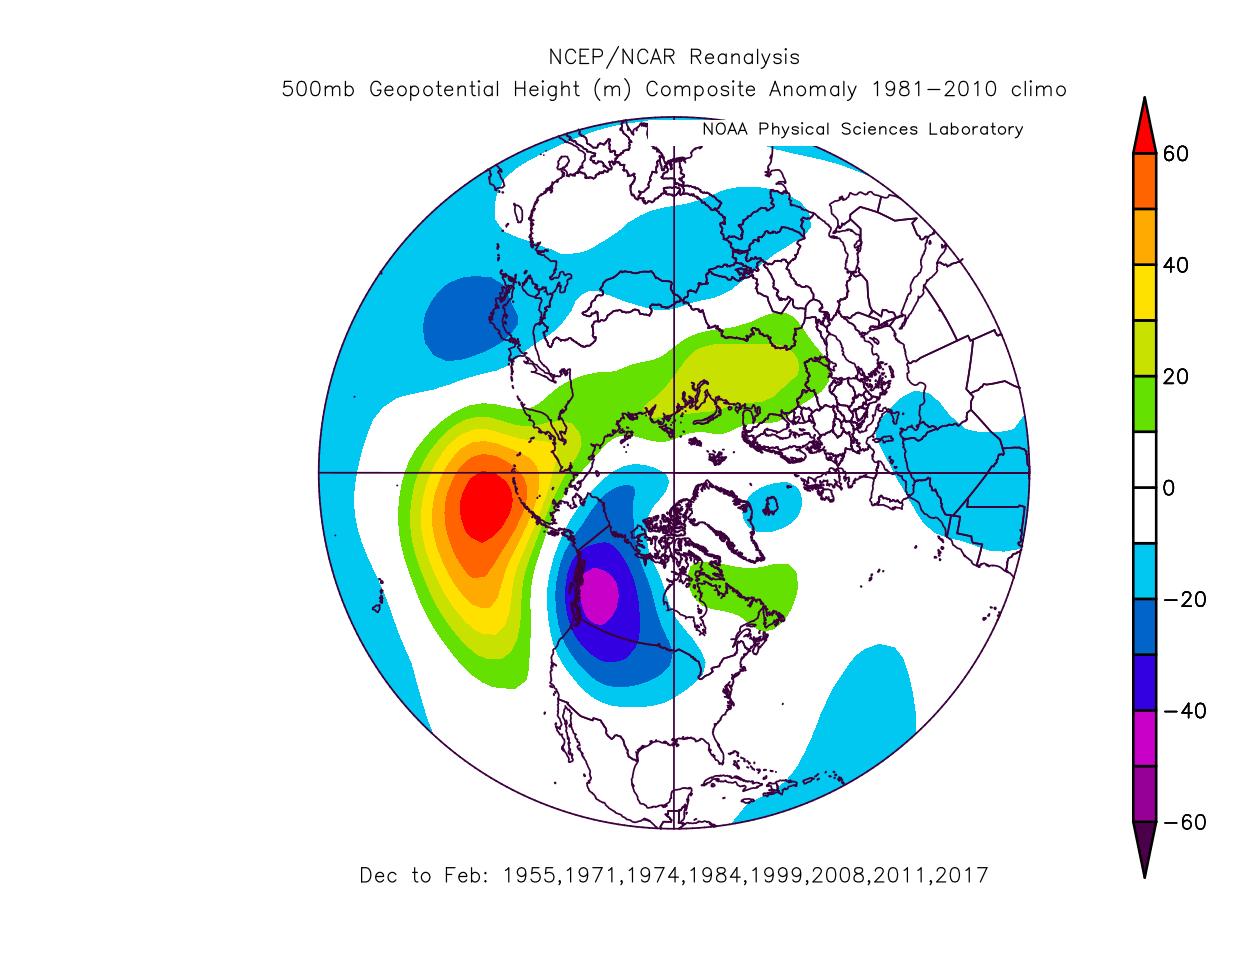 first-year-la-nina-winter-weather-pattern-reanalysis